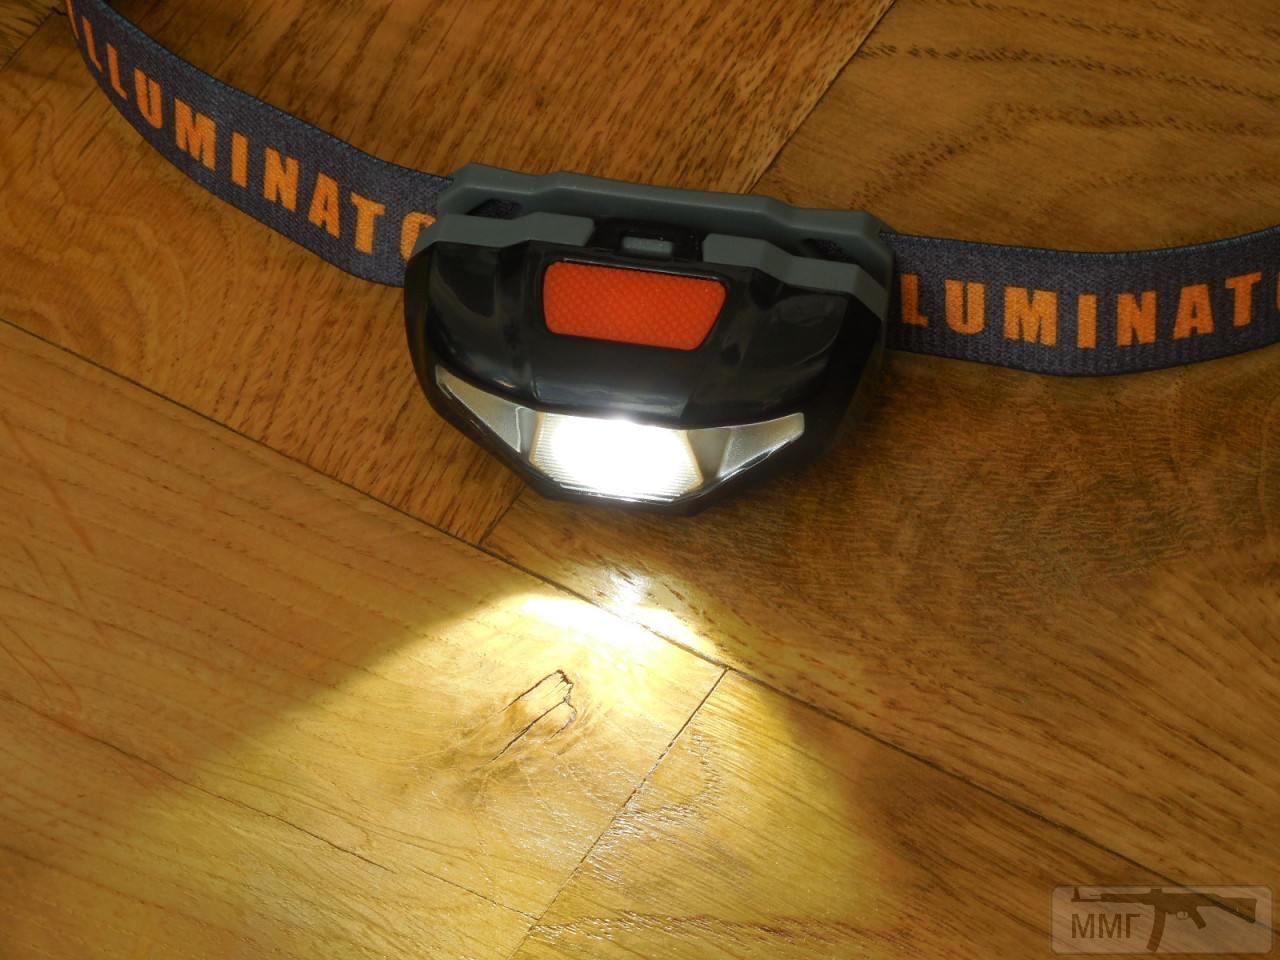 87303 - Налобный фонарь Sunree Ree koпiя на батарейку АА 1,5в. аккум 14500 Li-on